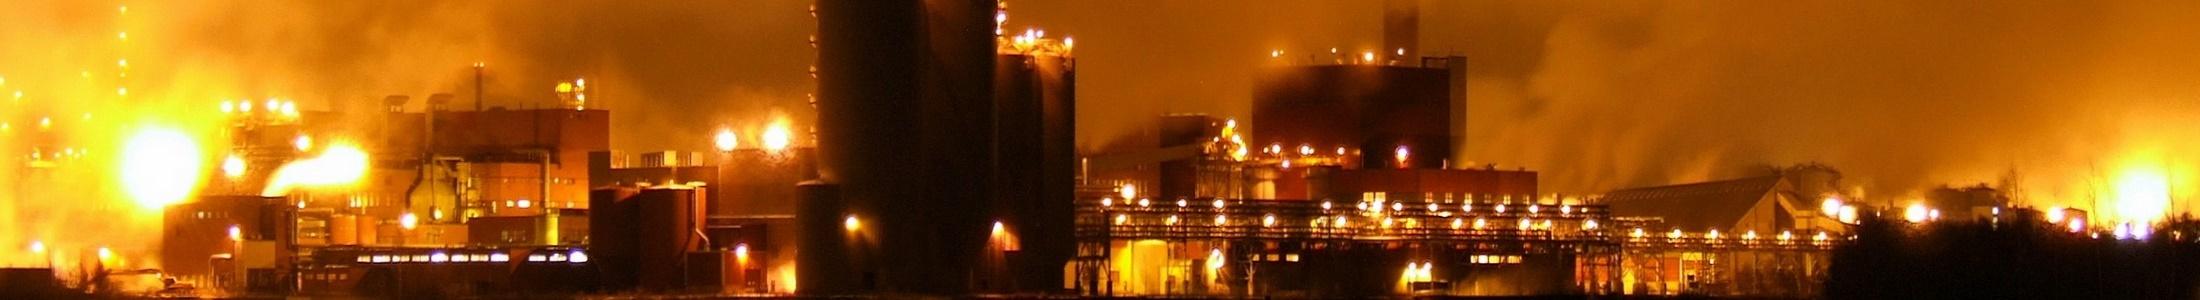 Digital Signage industriële omgevingen